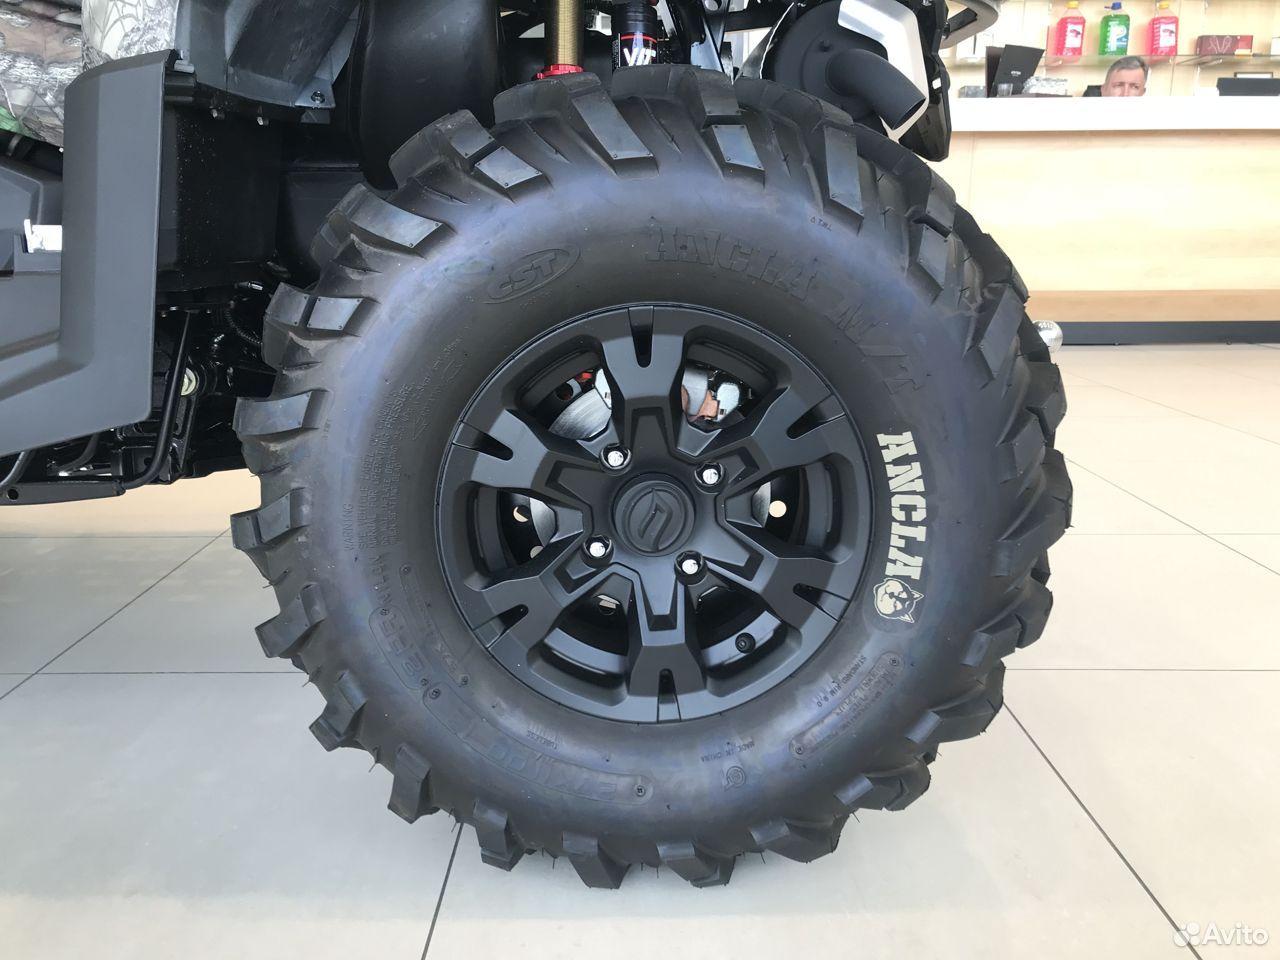 Квадроцикл cfmoto cforce 800 HO EPS (X8 H.O.EPS)  88792225000 купить 4